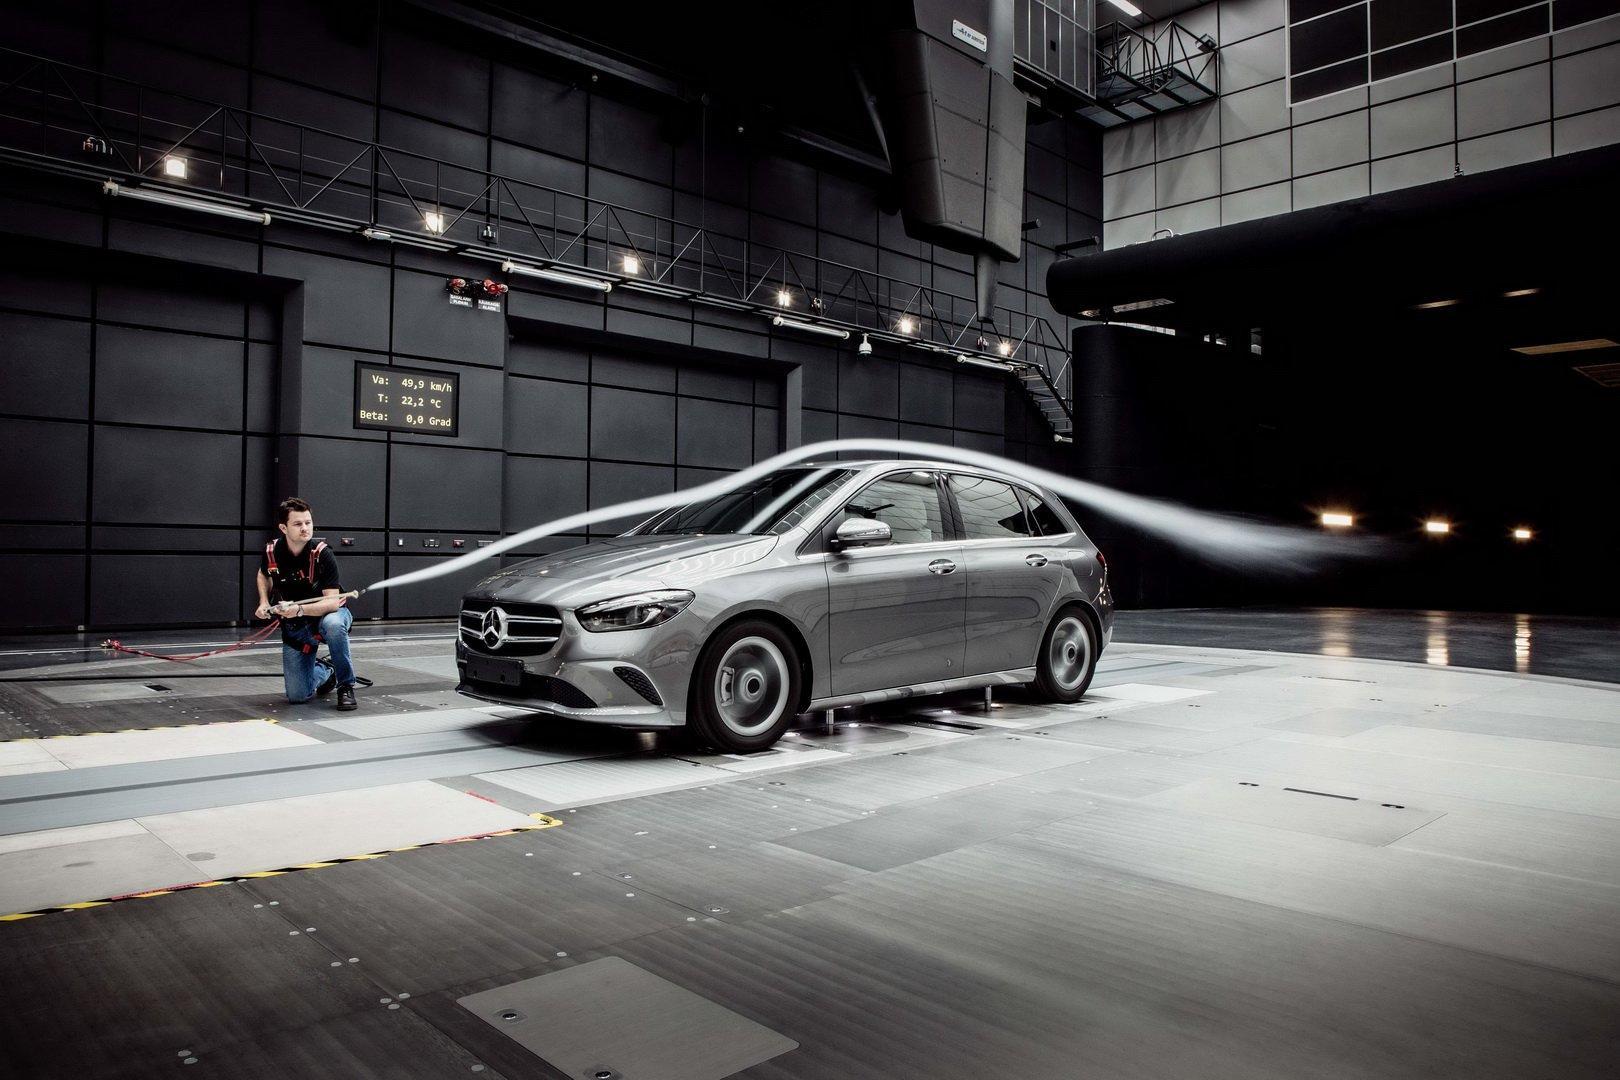 2019 Mercedes-Benz B-Class - 2019 Mercedes-Benz B-Class